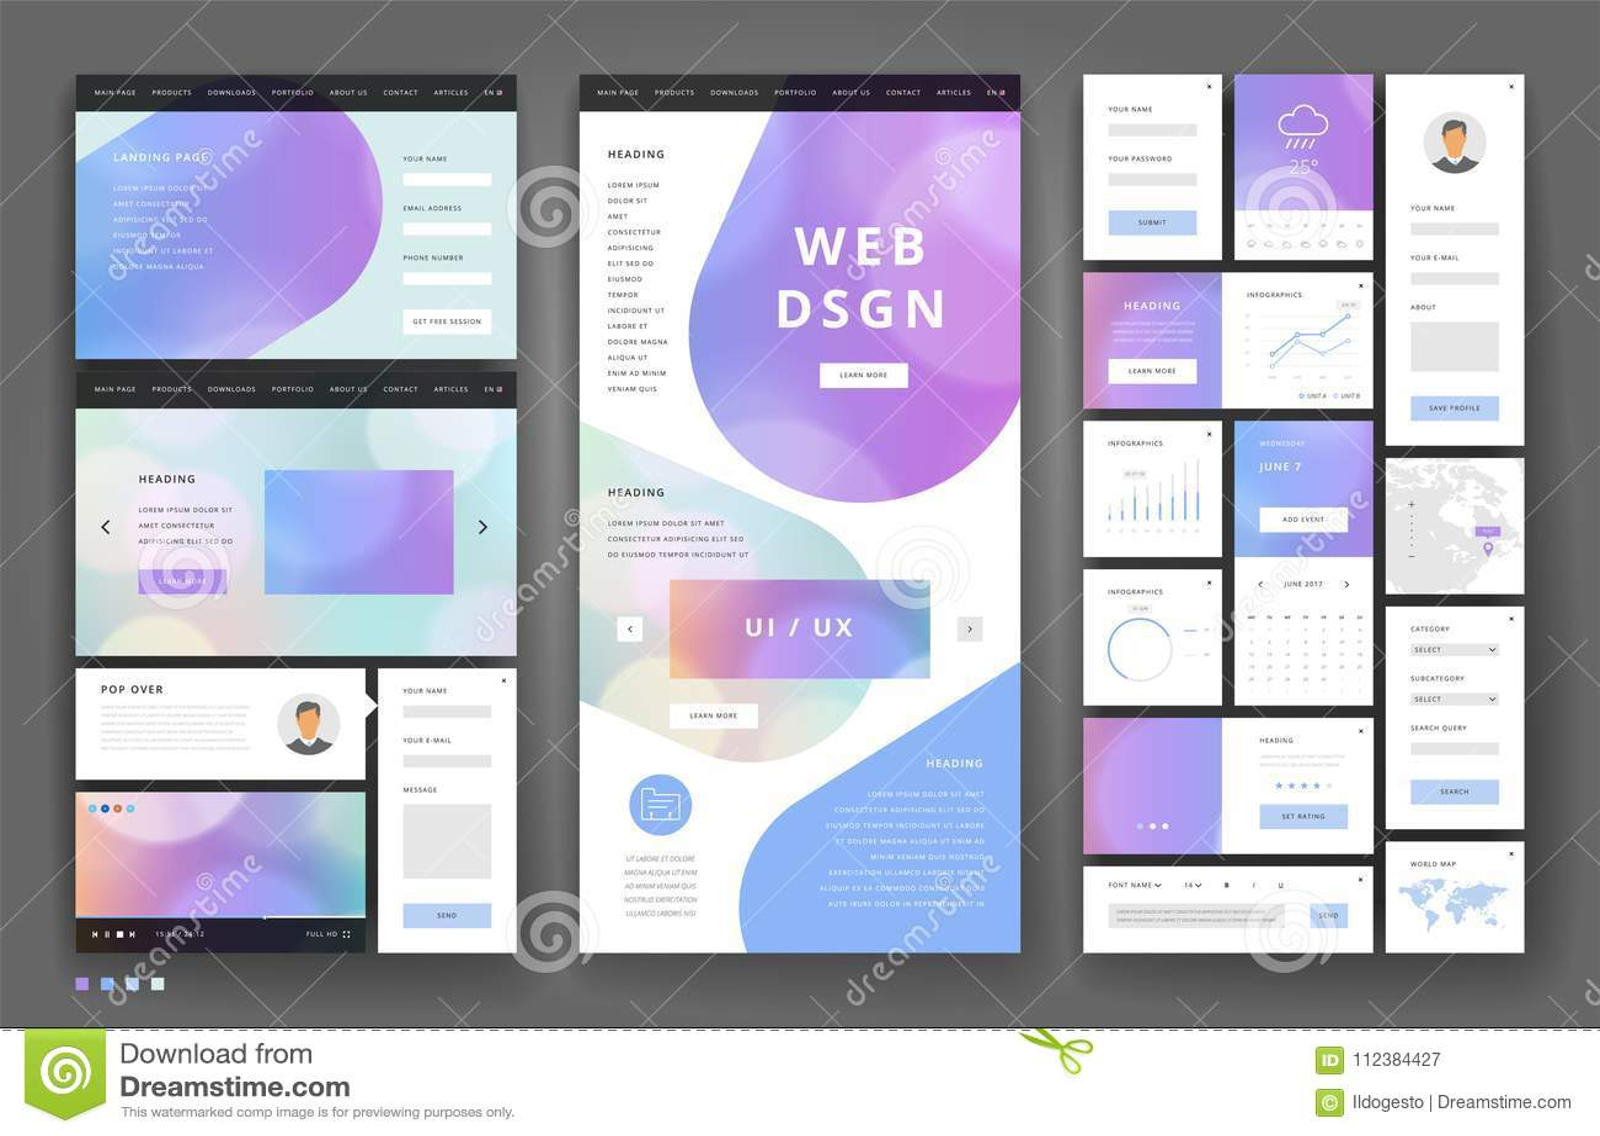 Дизайн шаблона вебсайта с элементами интерфейса